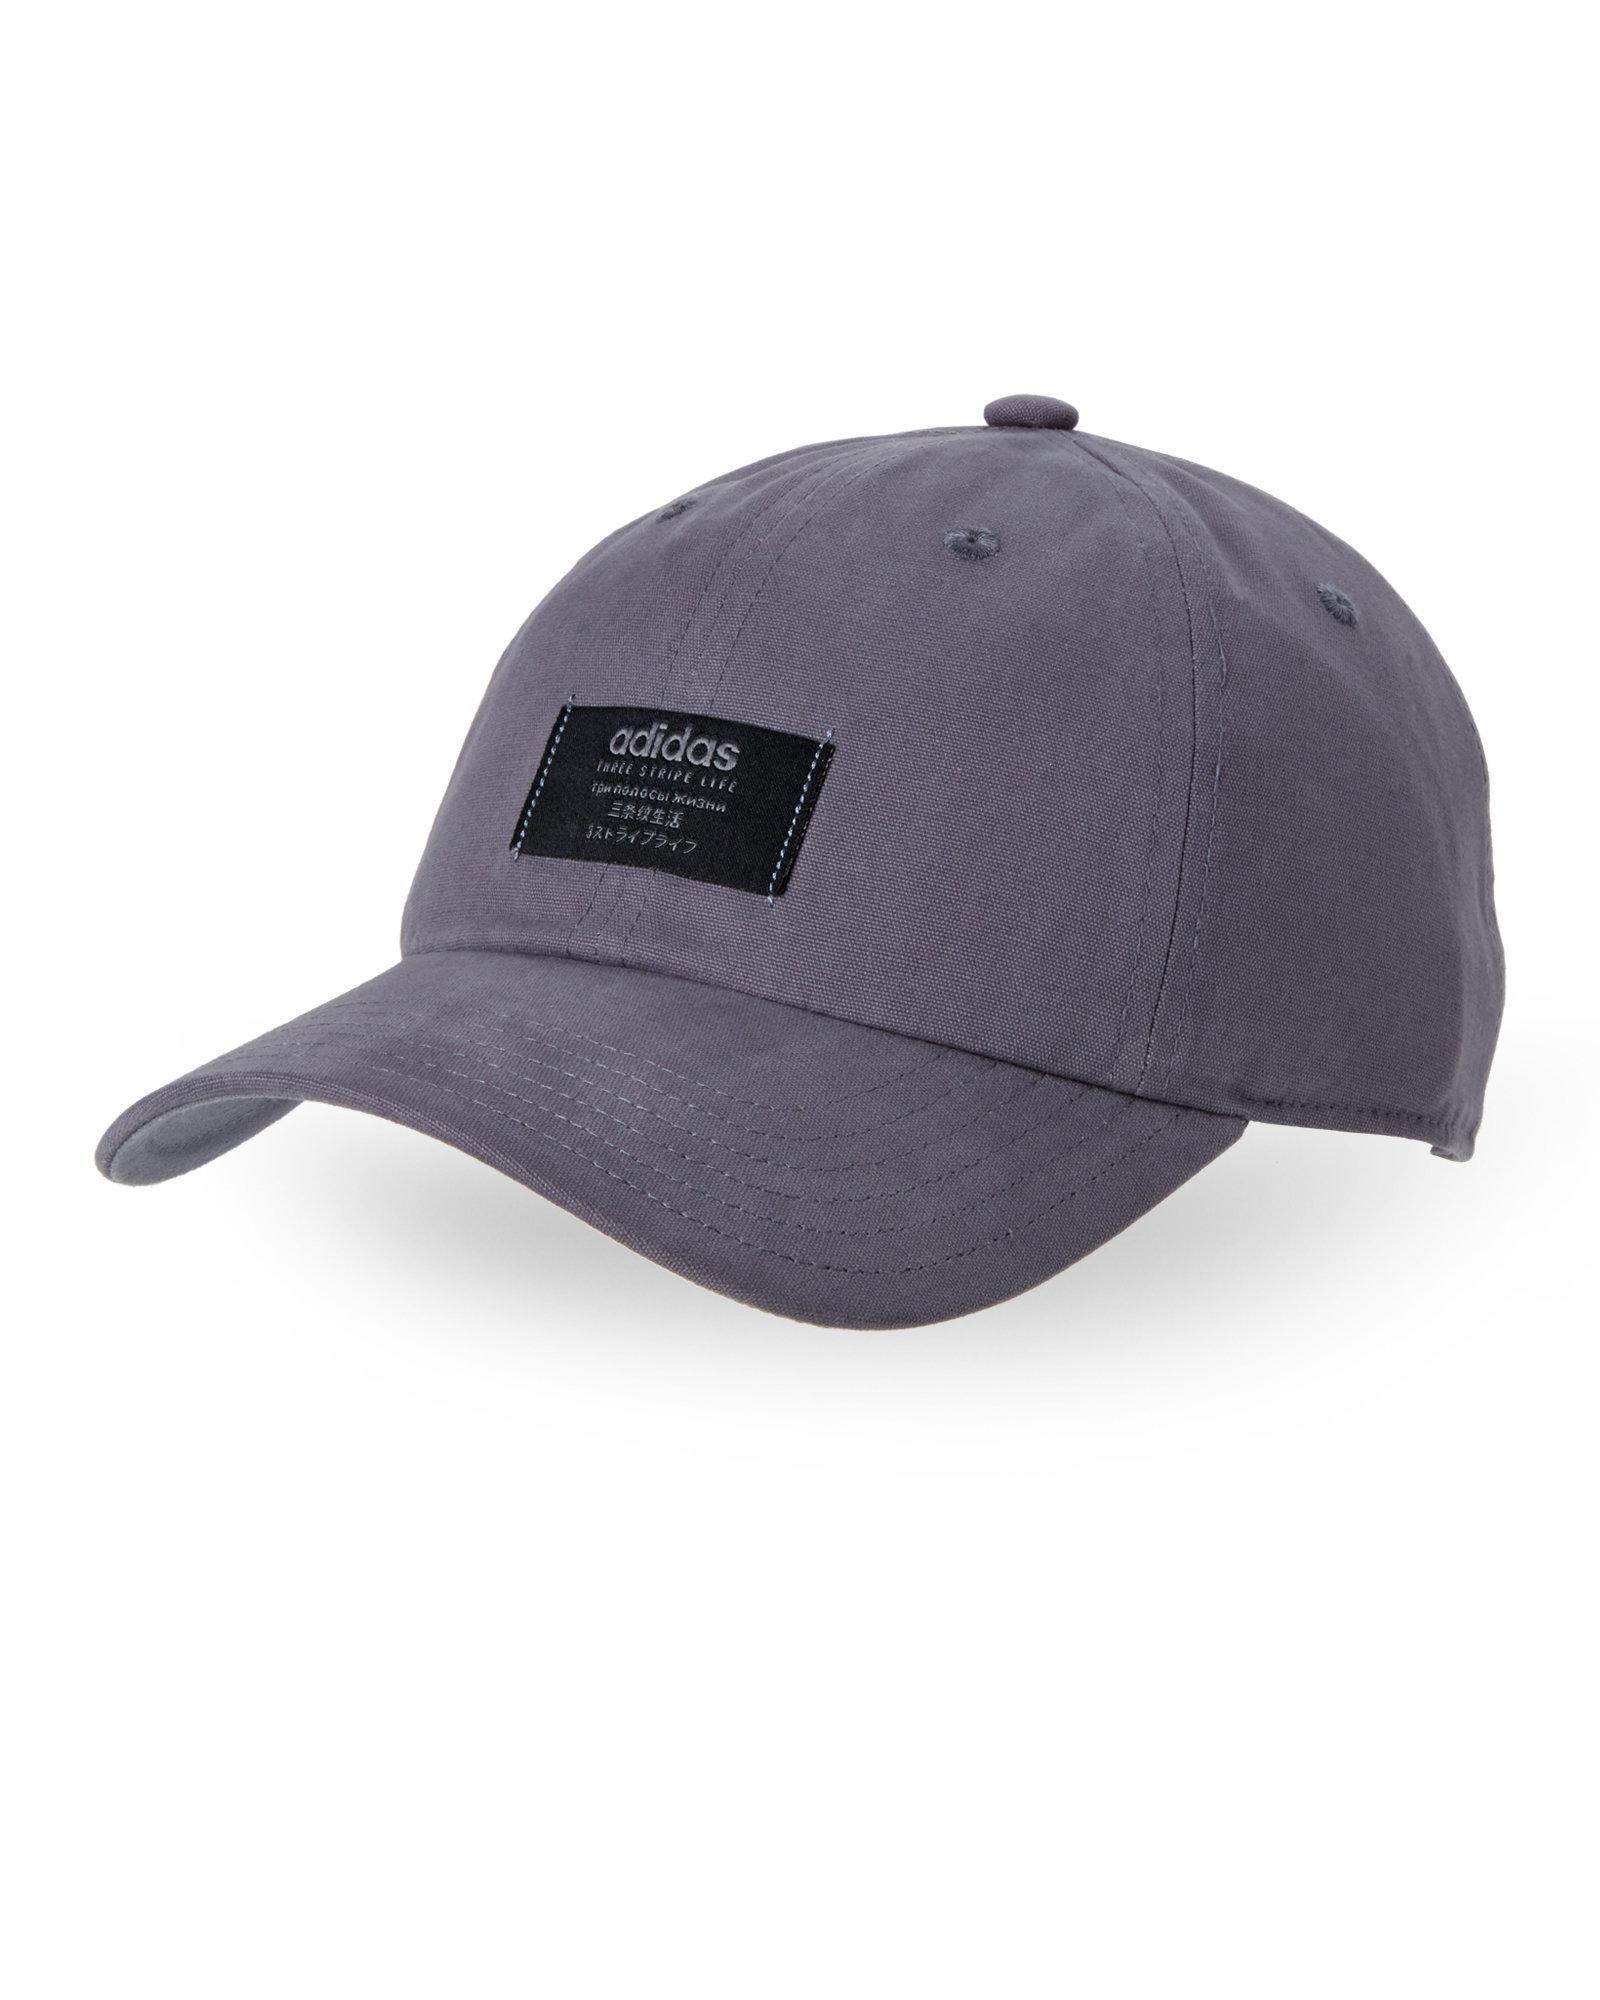 87f320704e4af Lyst - adidas Black Onyx Impulse Cap in Black for Men